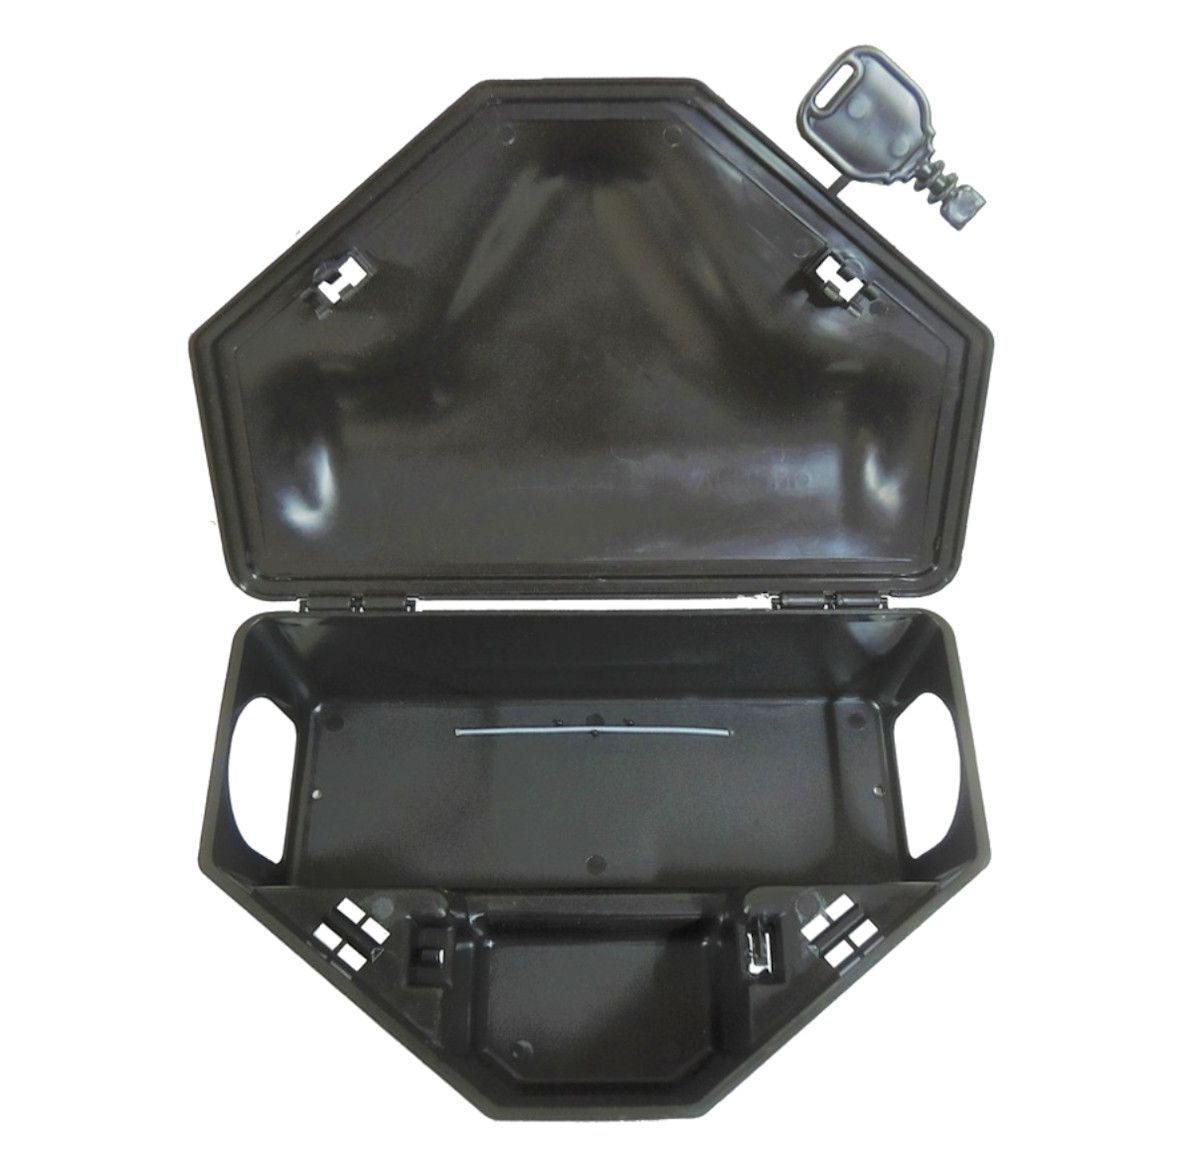 Kit 70 Porta Isca C/2 Chaves + 70 Bloco Extrusado Mata Seca